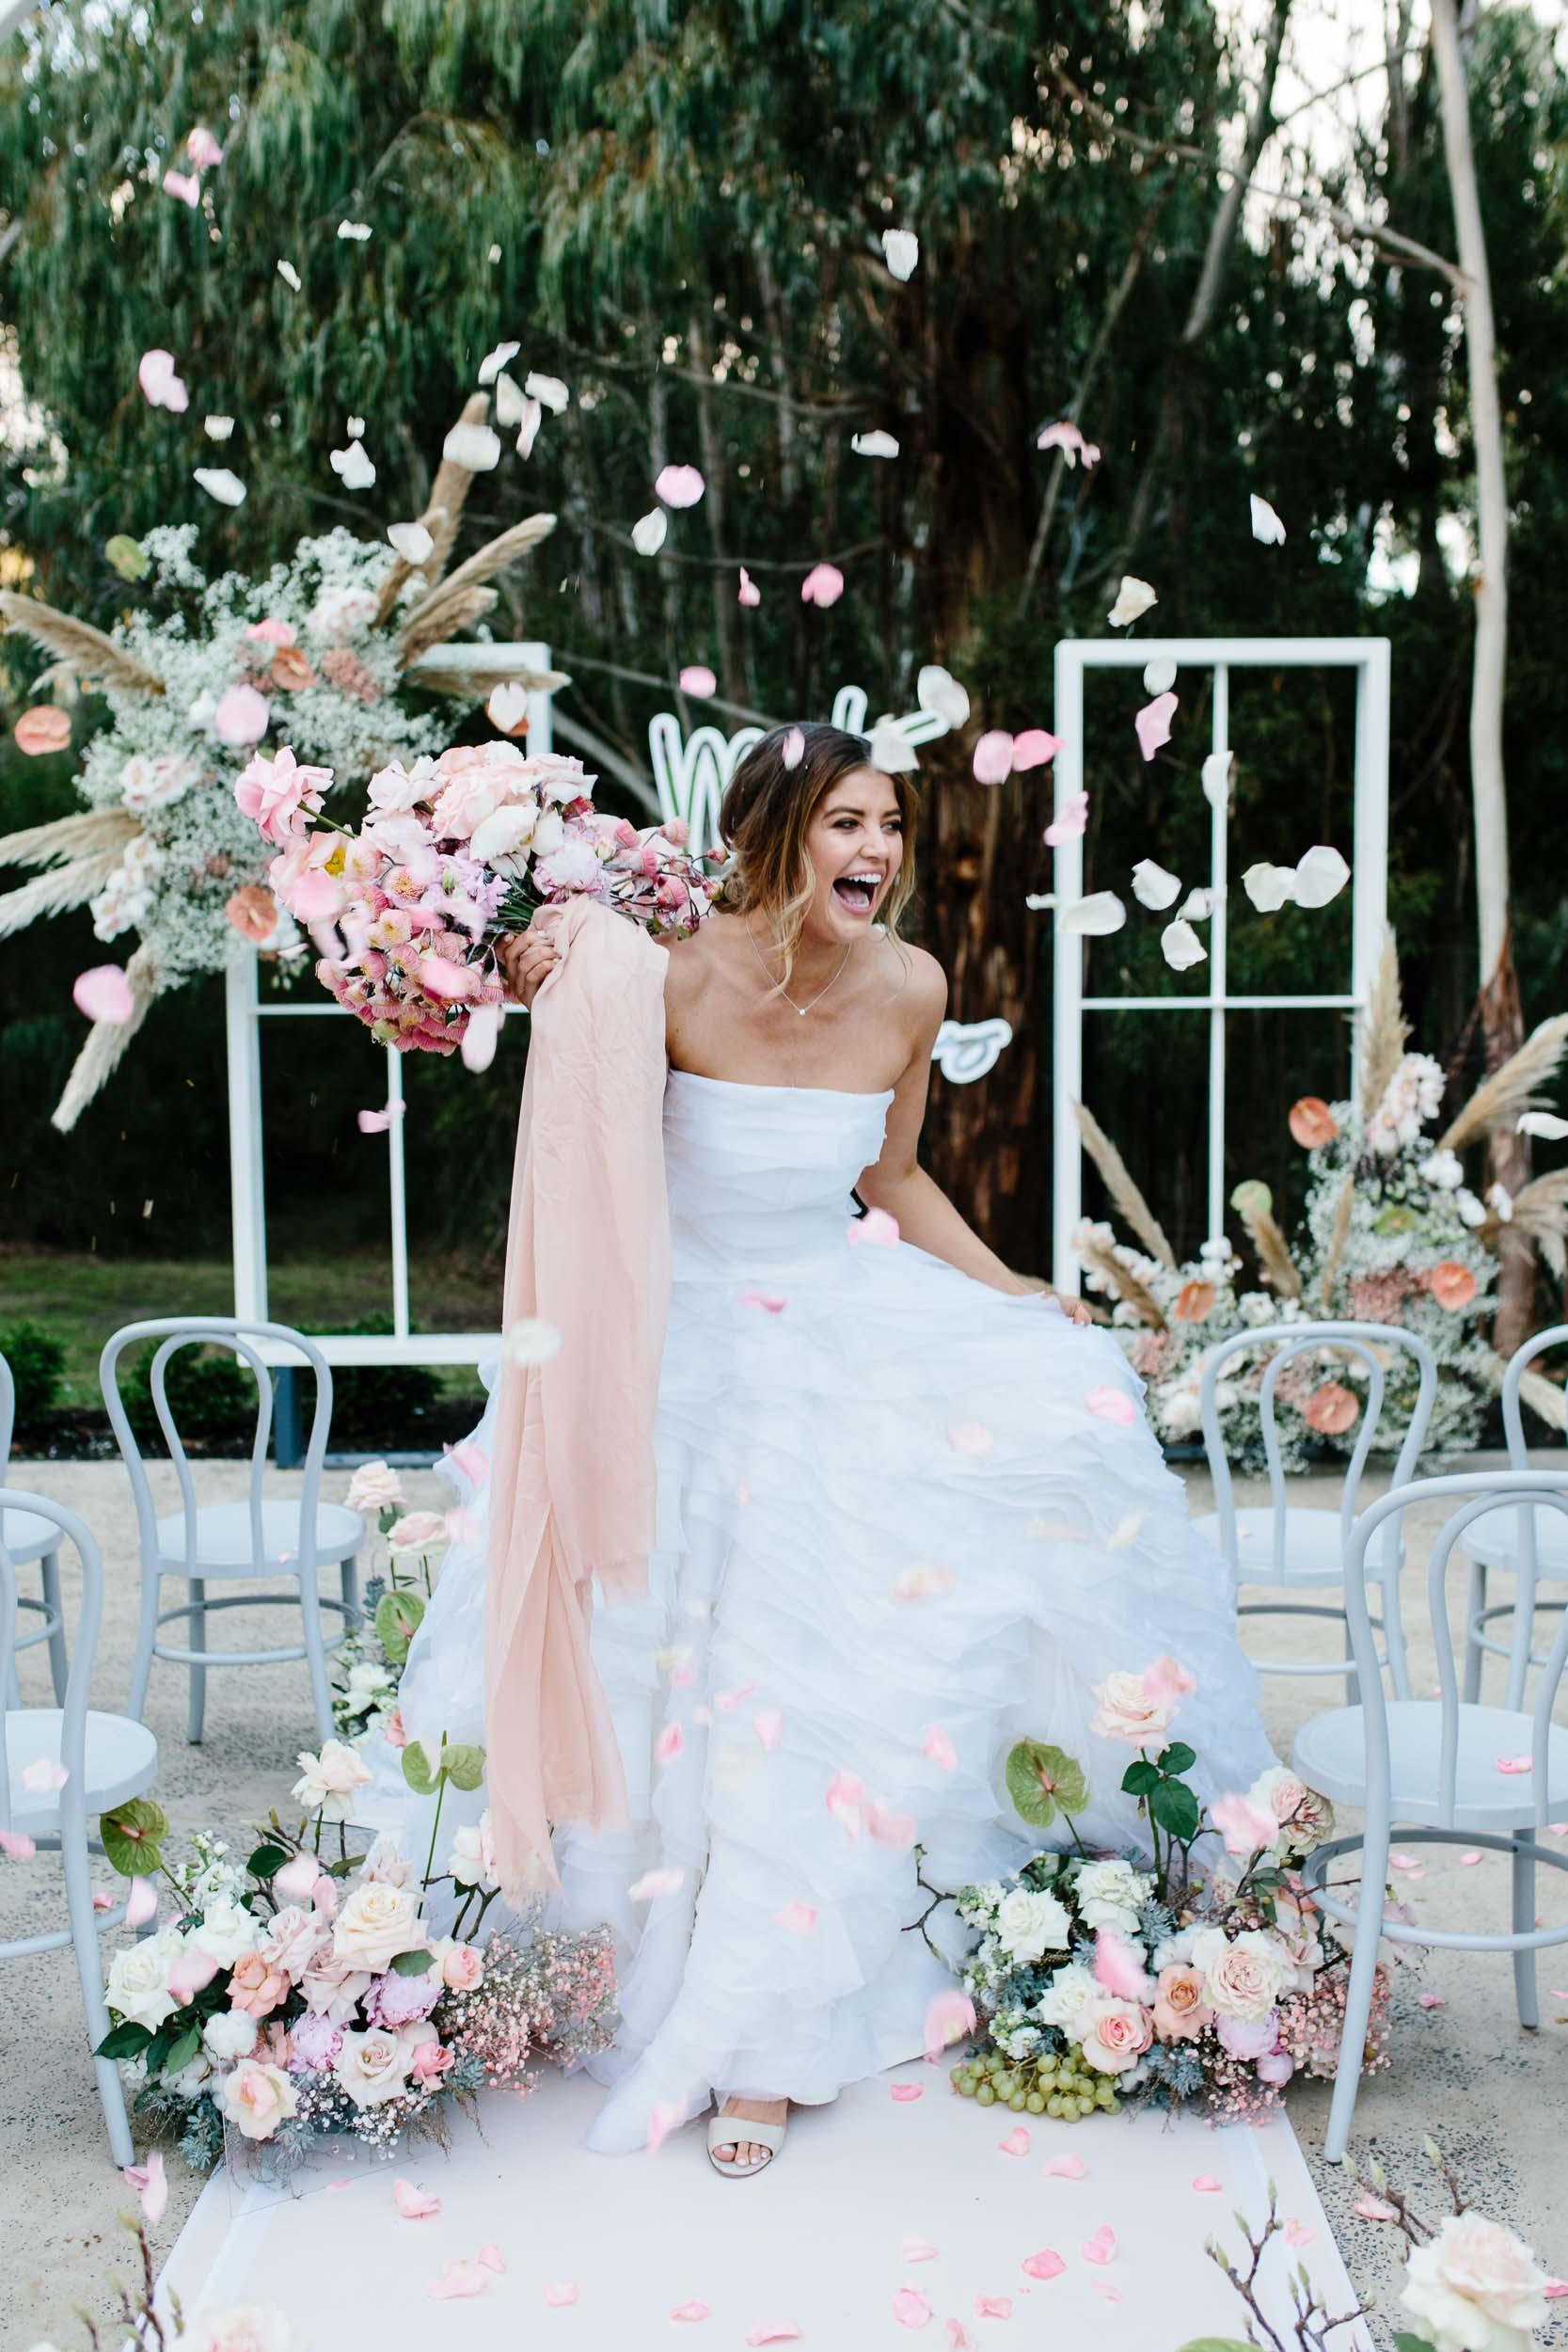 Kas-Richards-LENZO-Yarra-Valley-Wedding-One-Day-Bridal-338.jpg